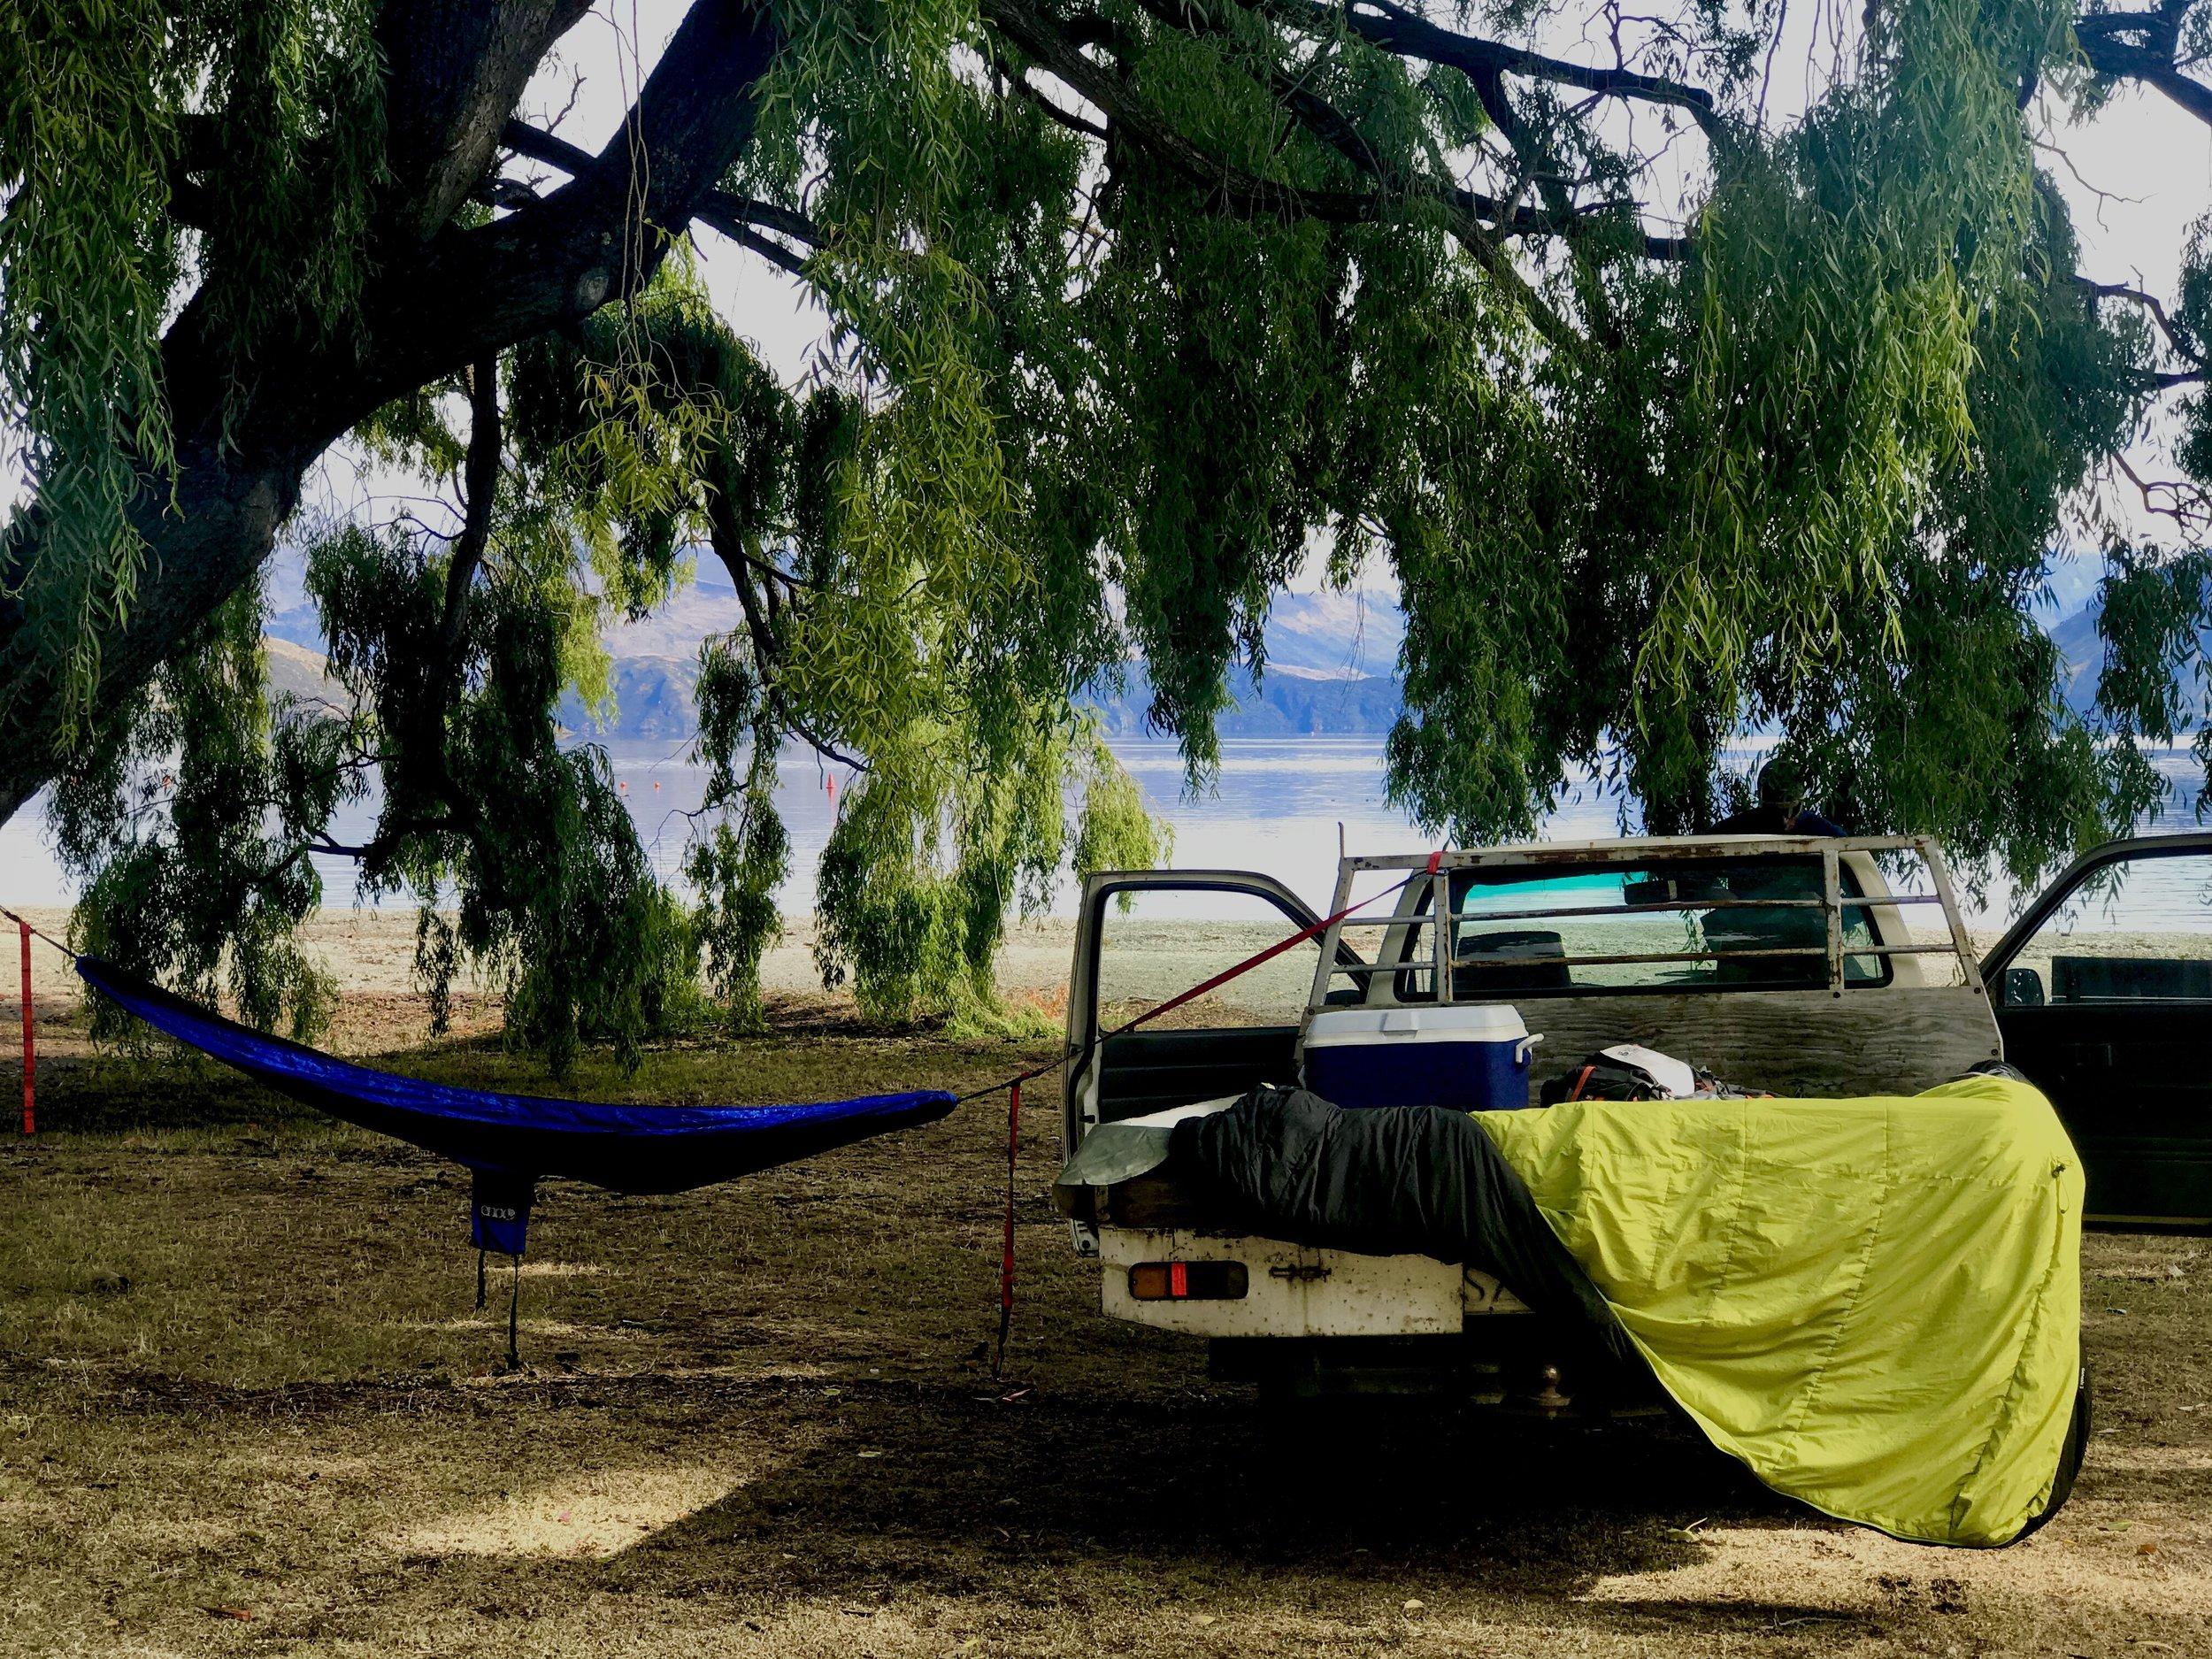 Freedom campers in Wanaka. Photo credit Nikki Heath, Wanaka Sun.